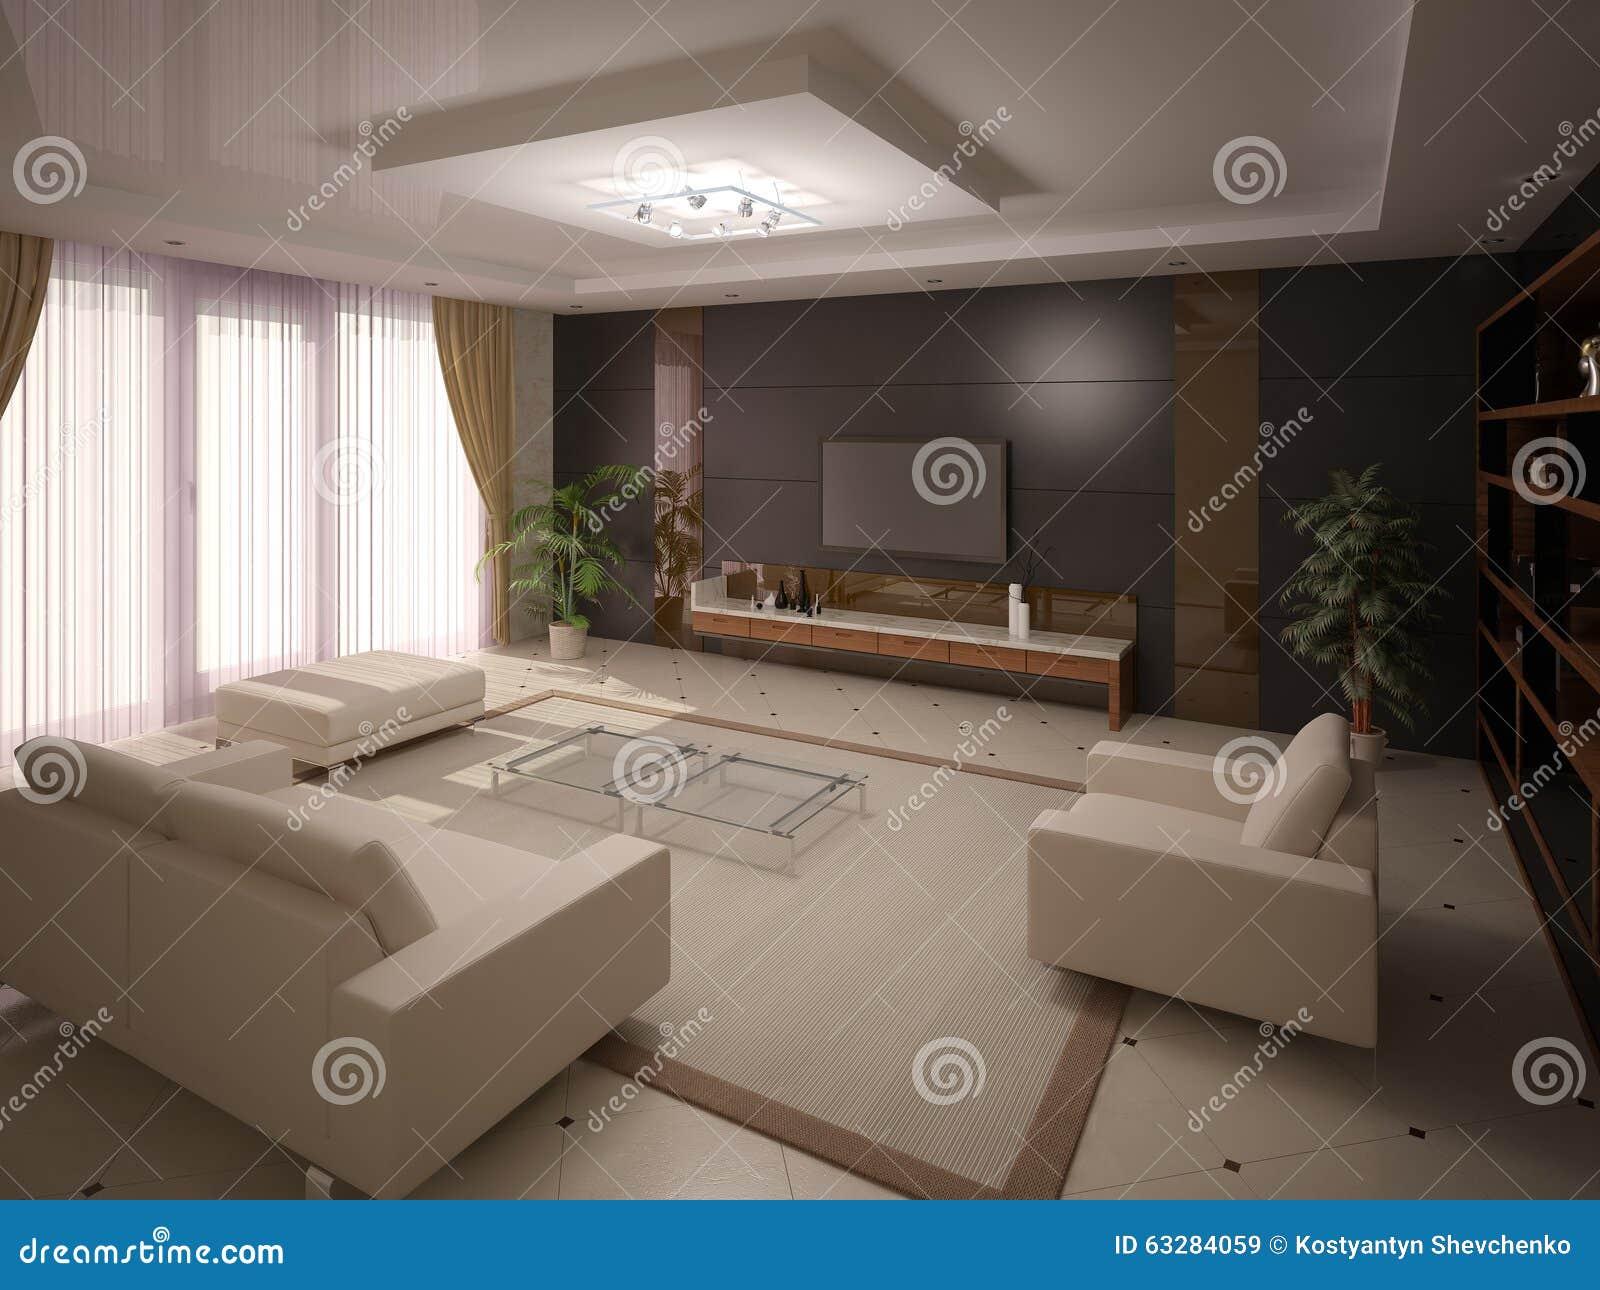 Comfortable Living Room Stock Illustration Image 63284059